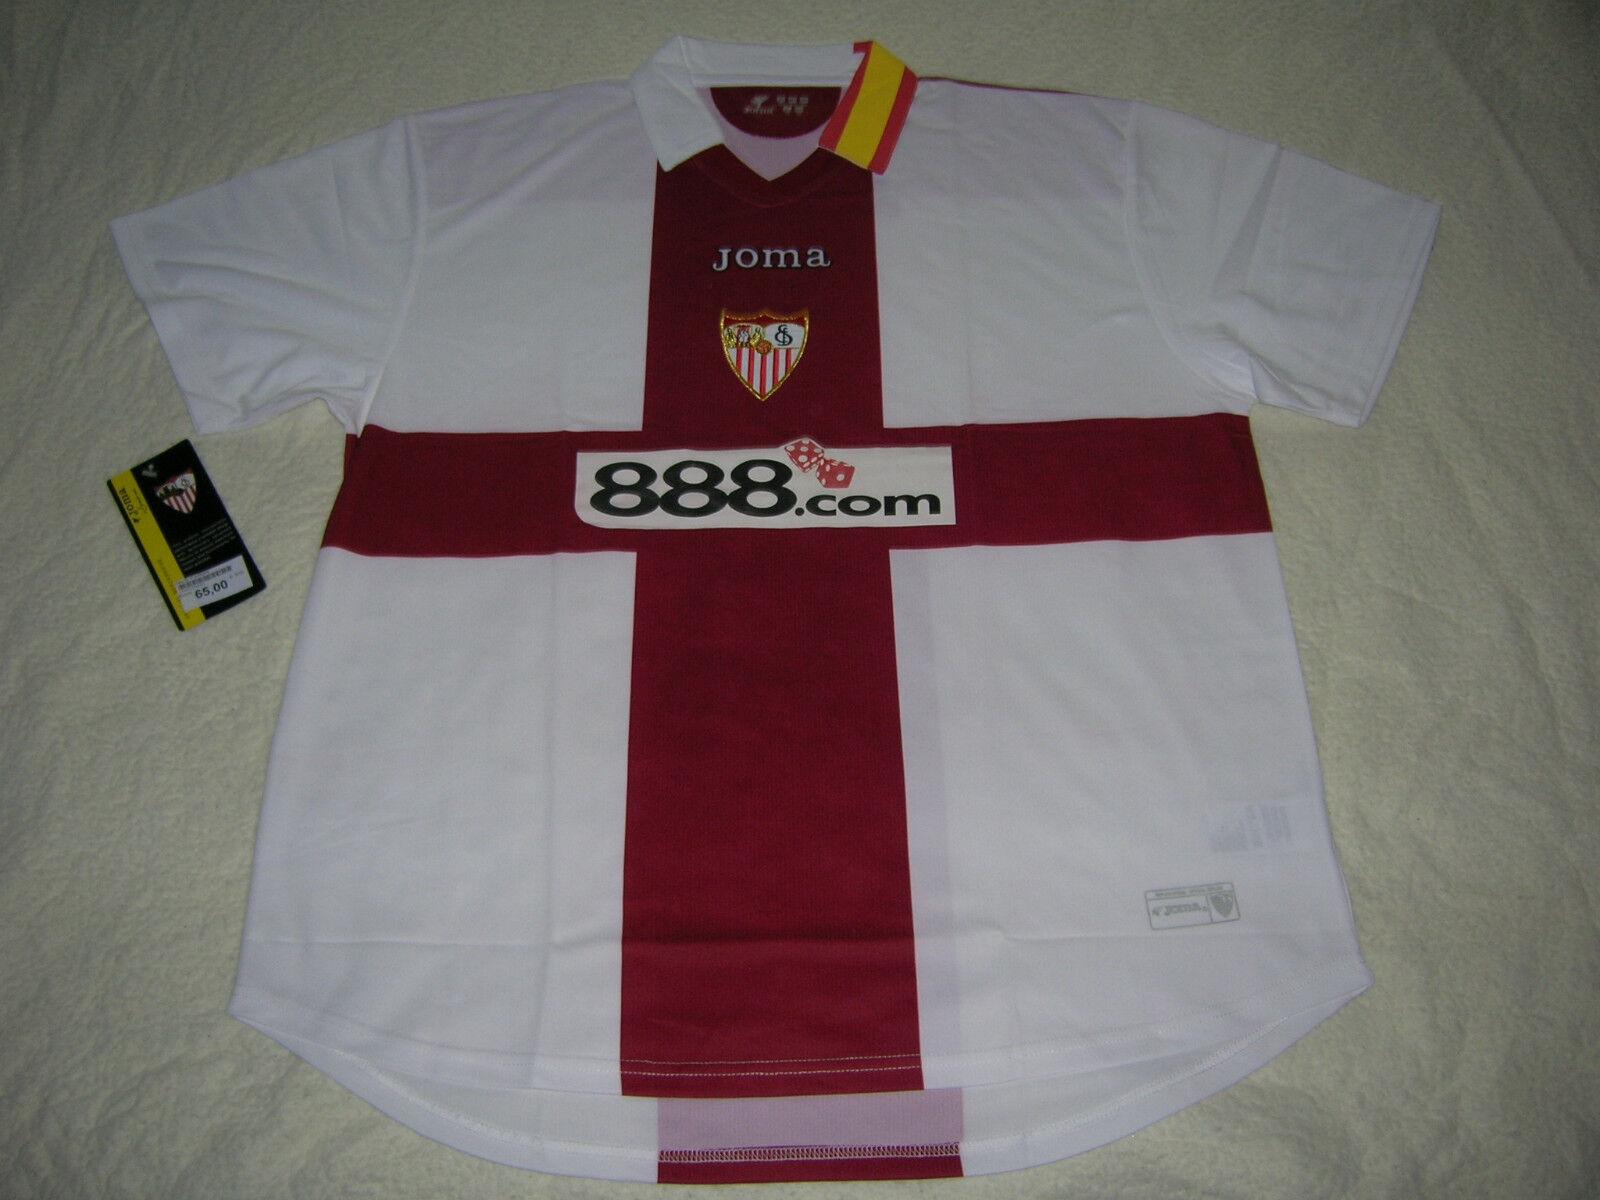 Camiseta de fútbol  Sevilla Joma Nueva  XXL  estilo clásico